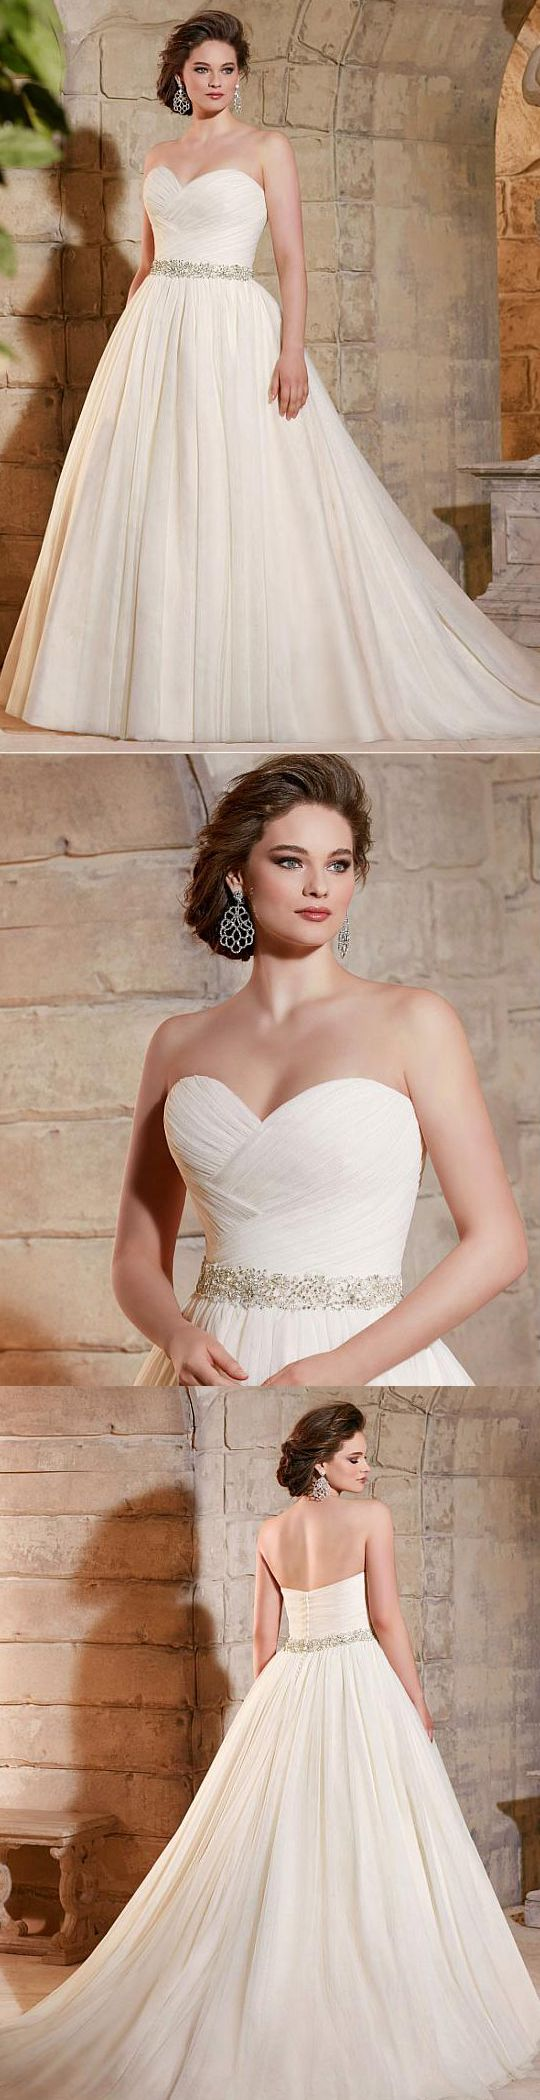 extravagant plus size wedding dresses wedding stuff